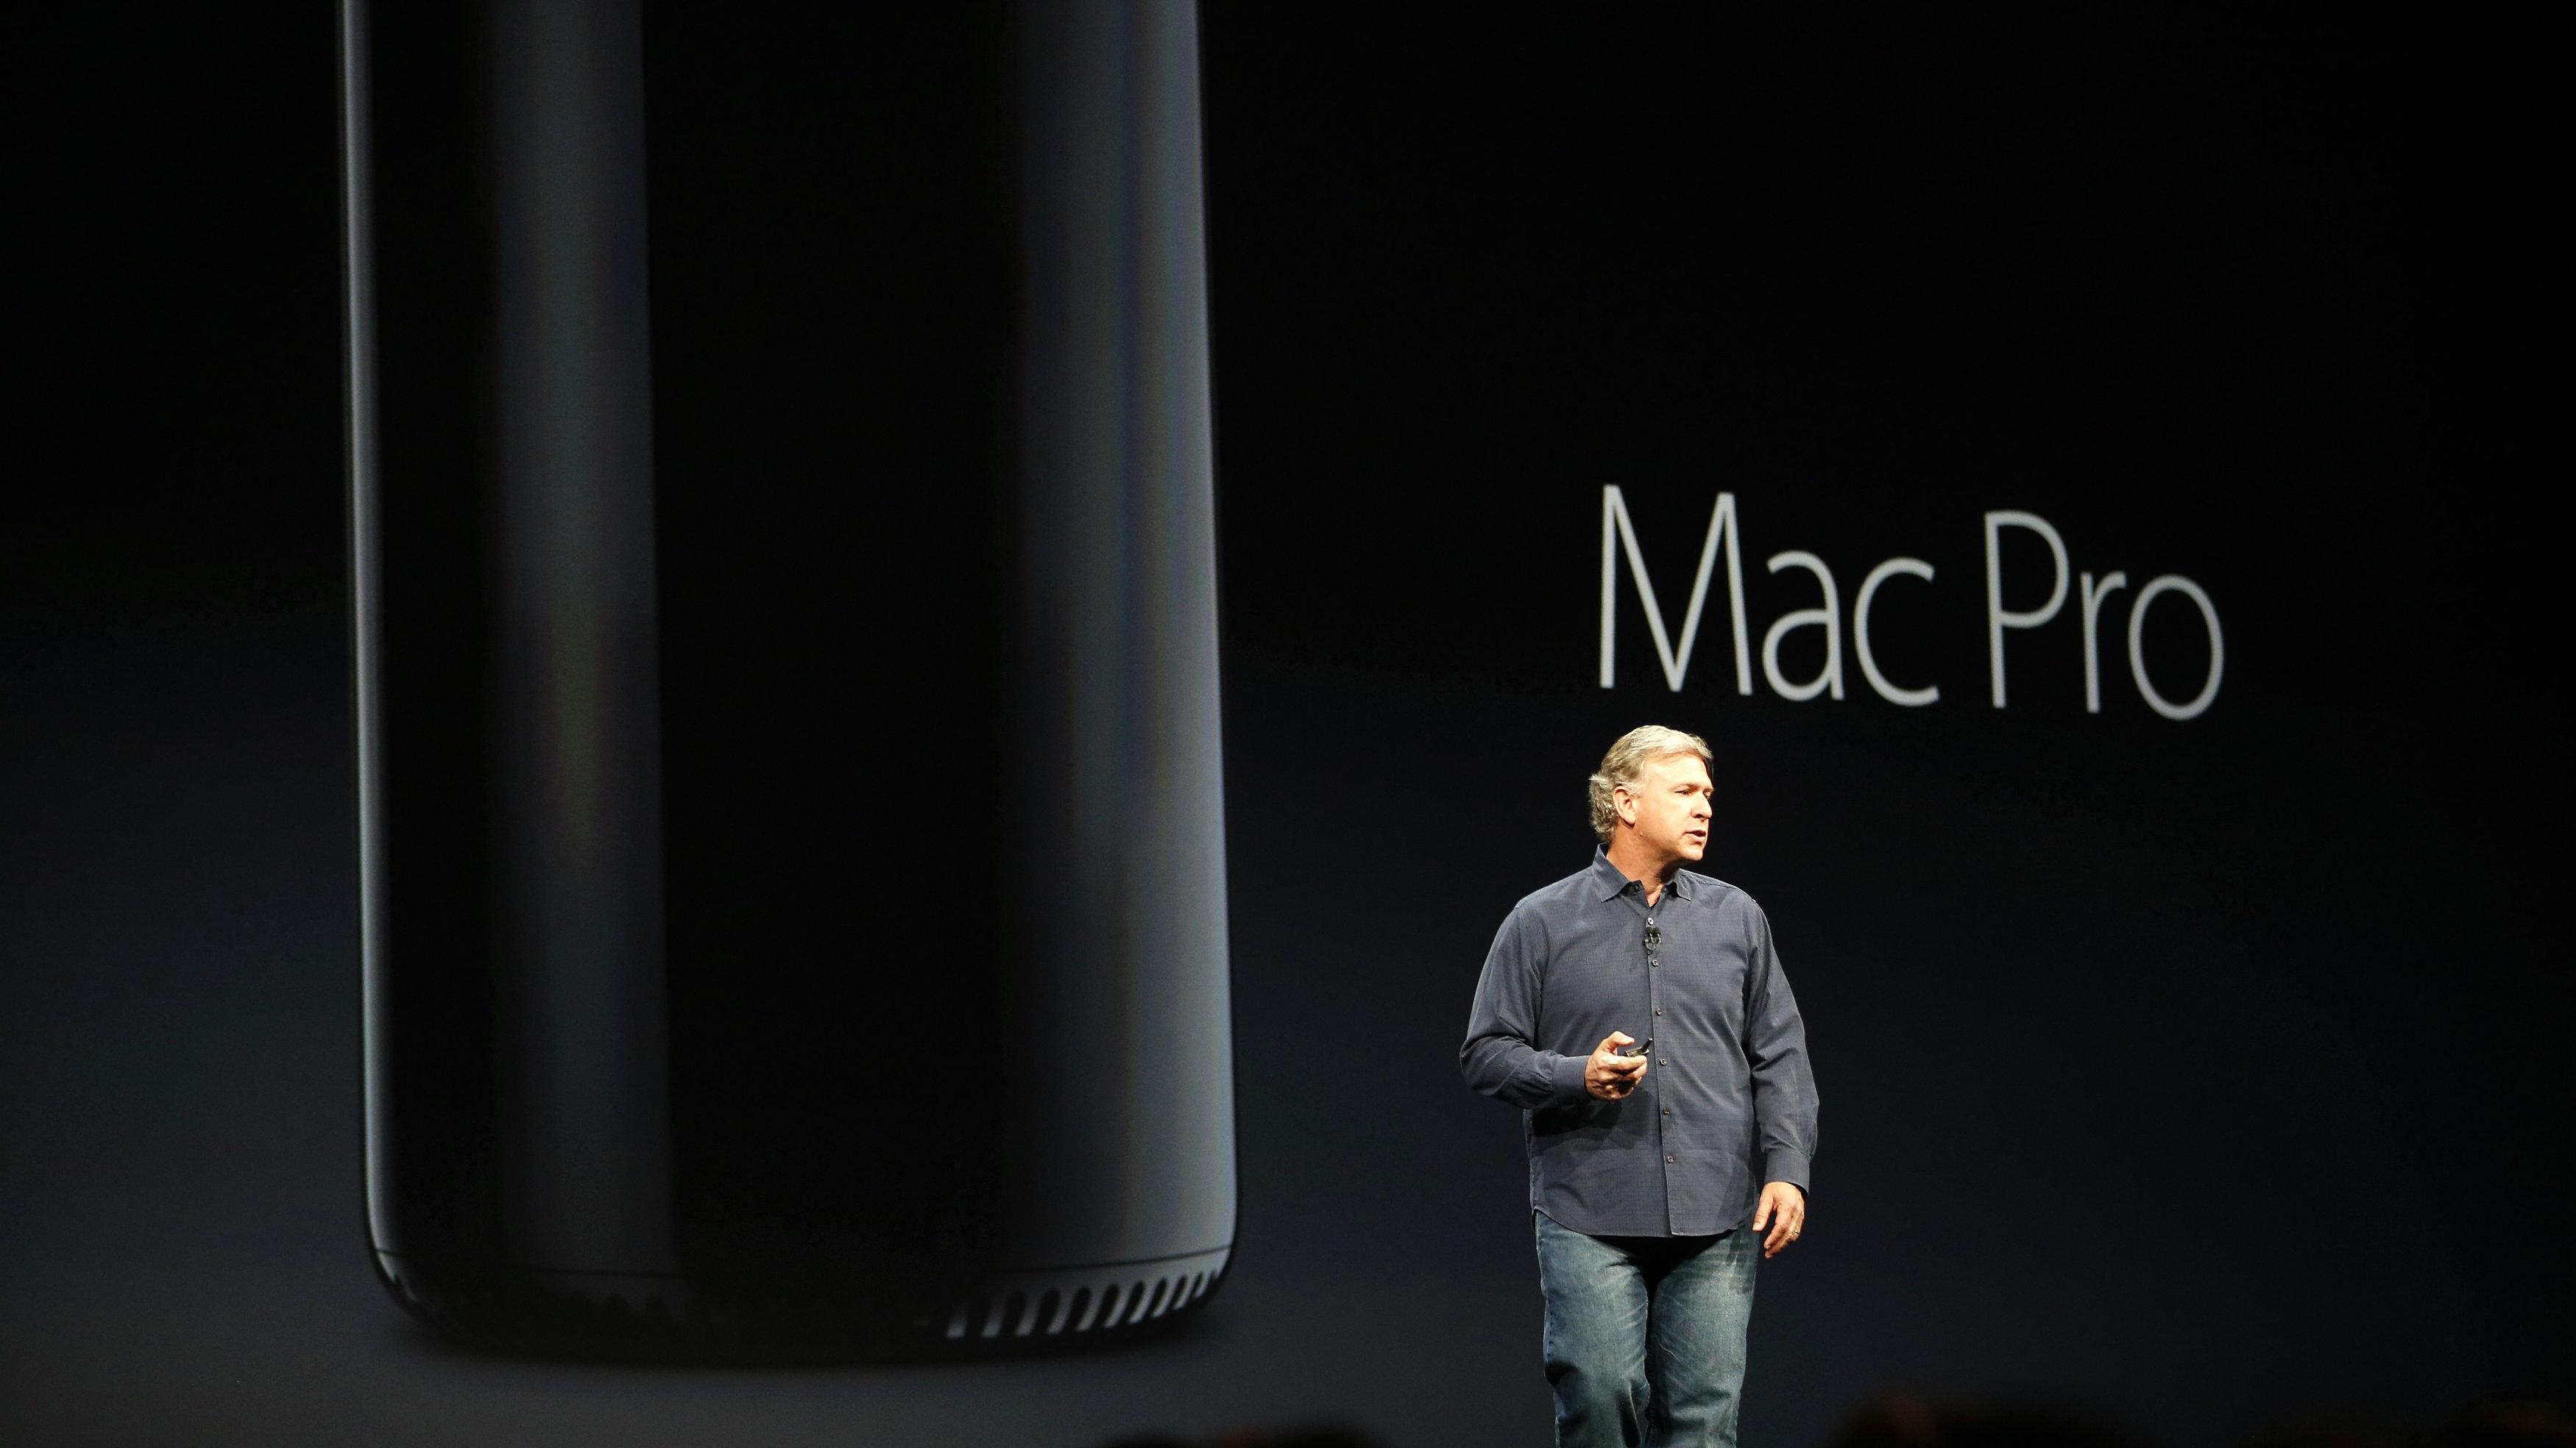 Mac Pro presentation